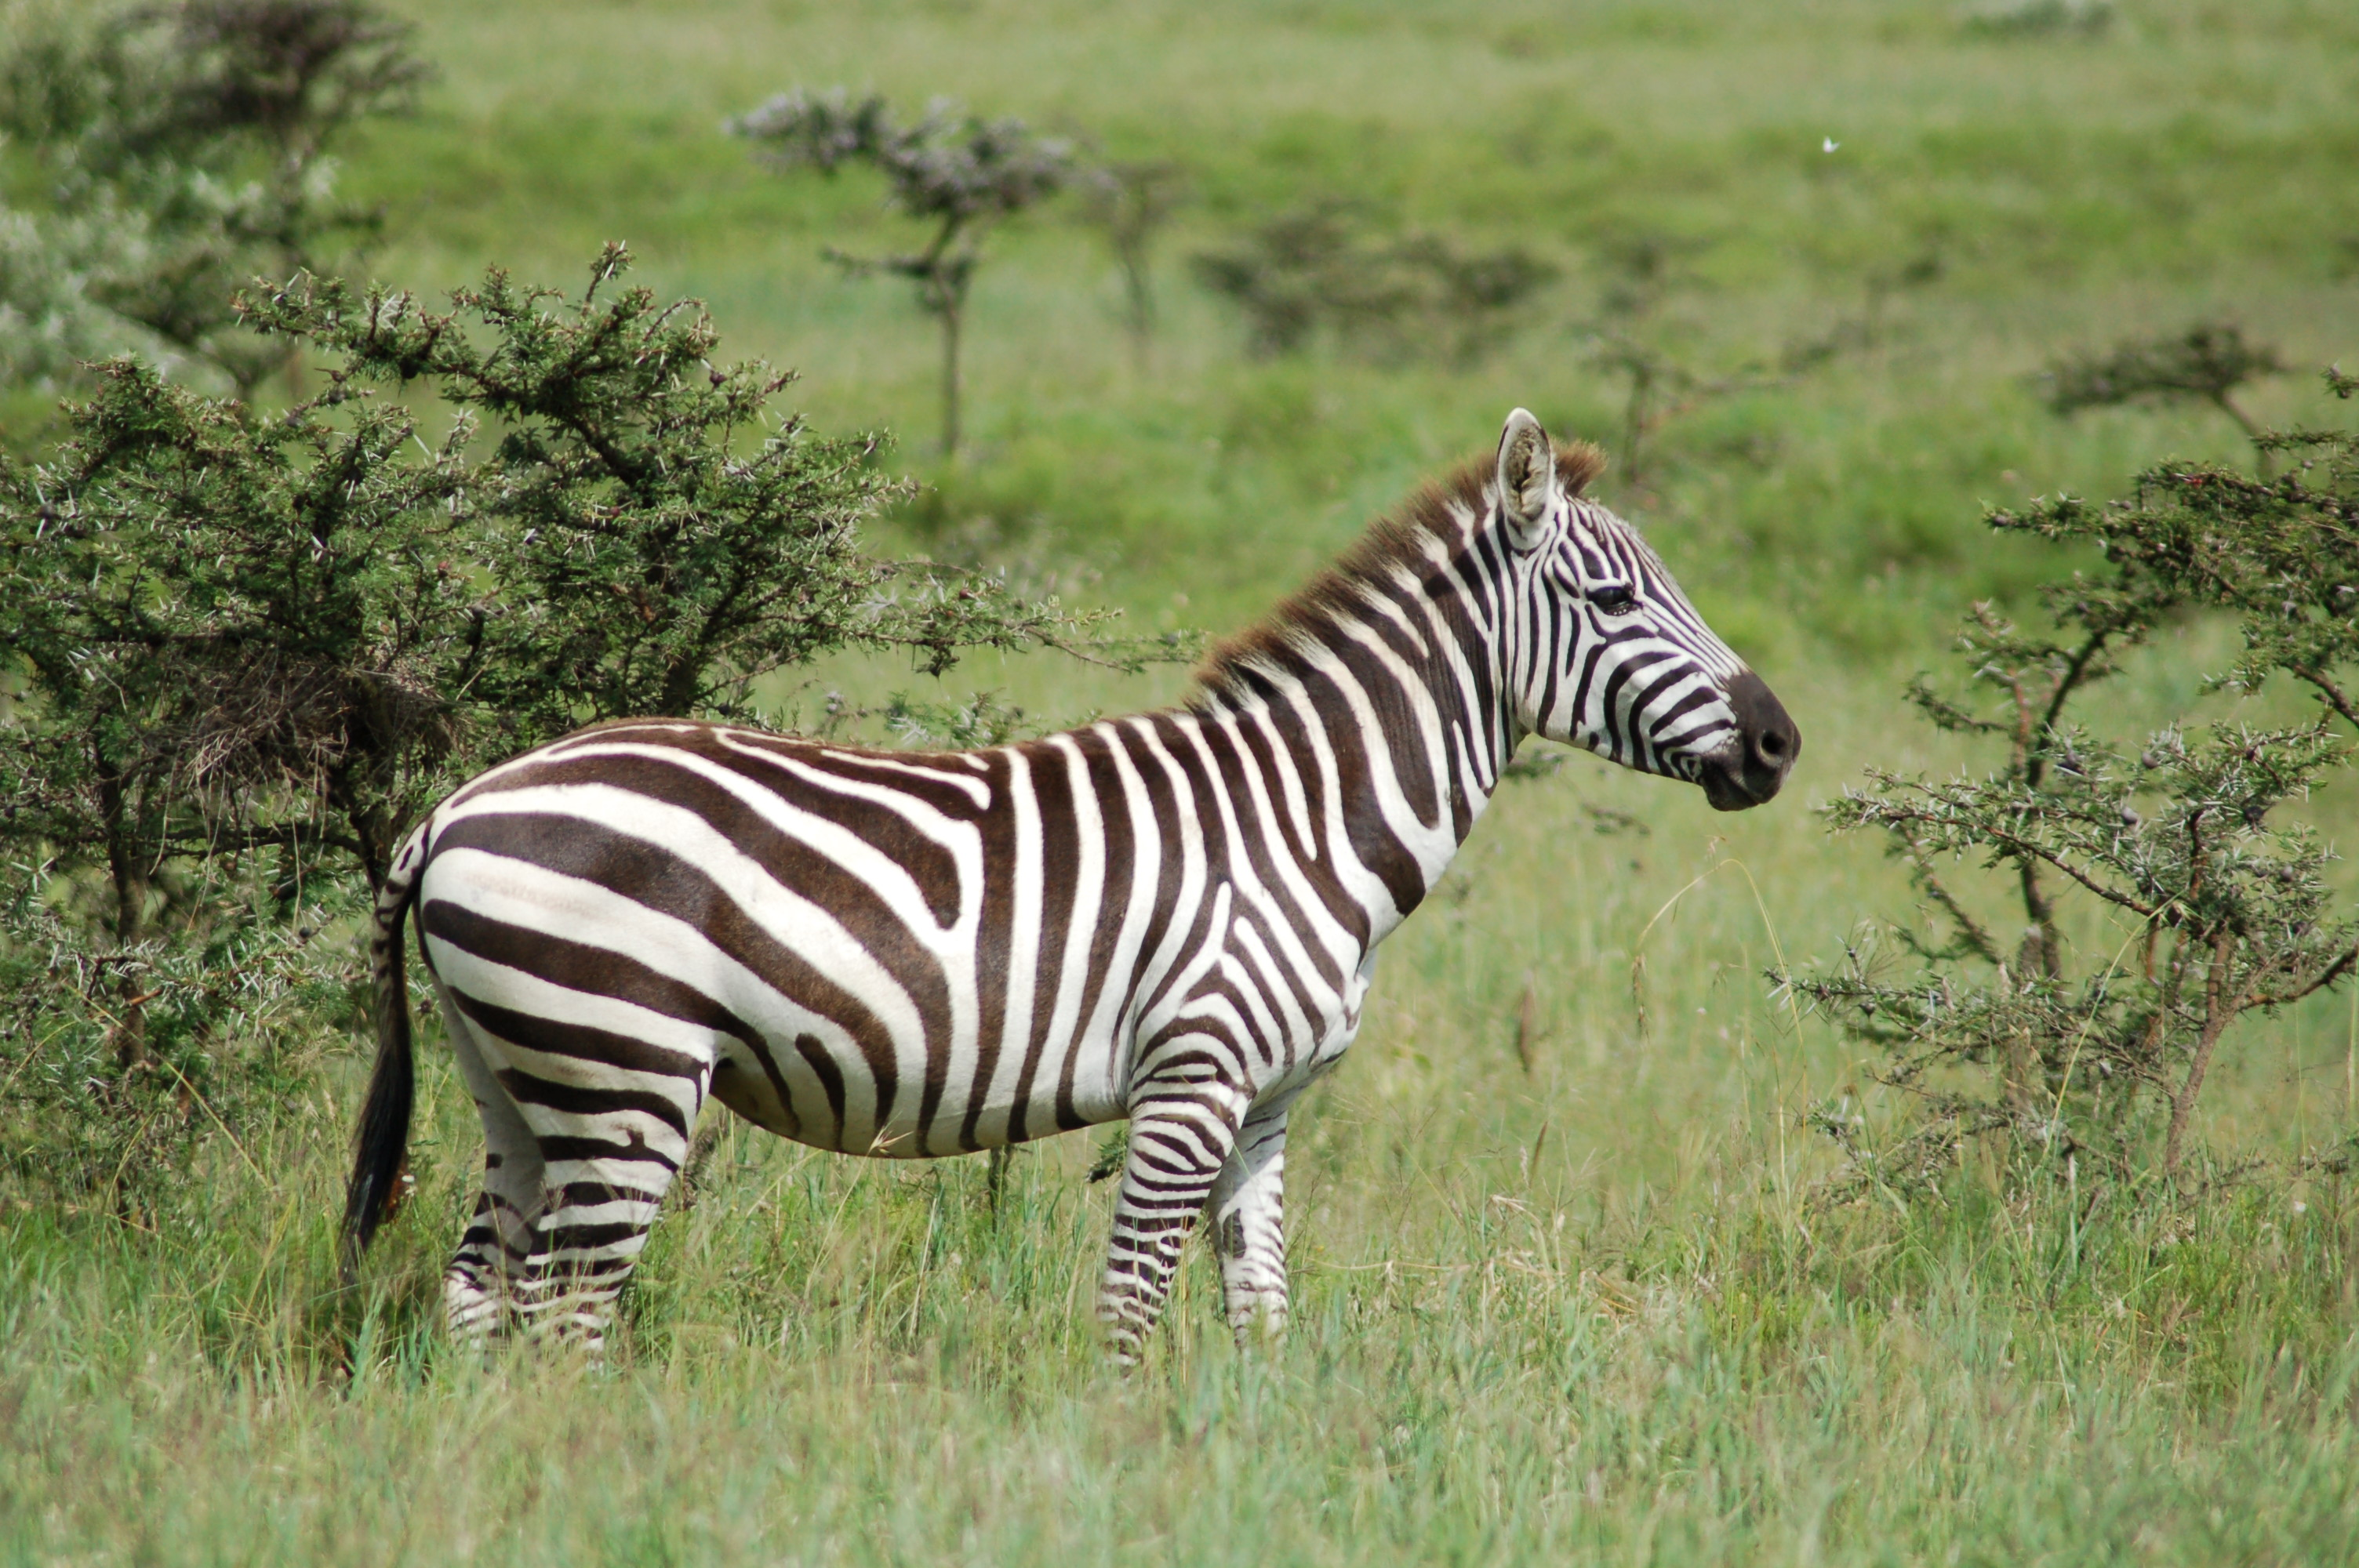 Zebra And Cheetah Bed Sheets